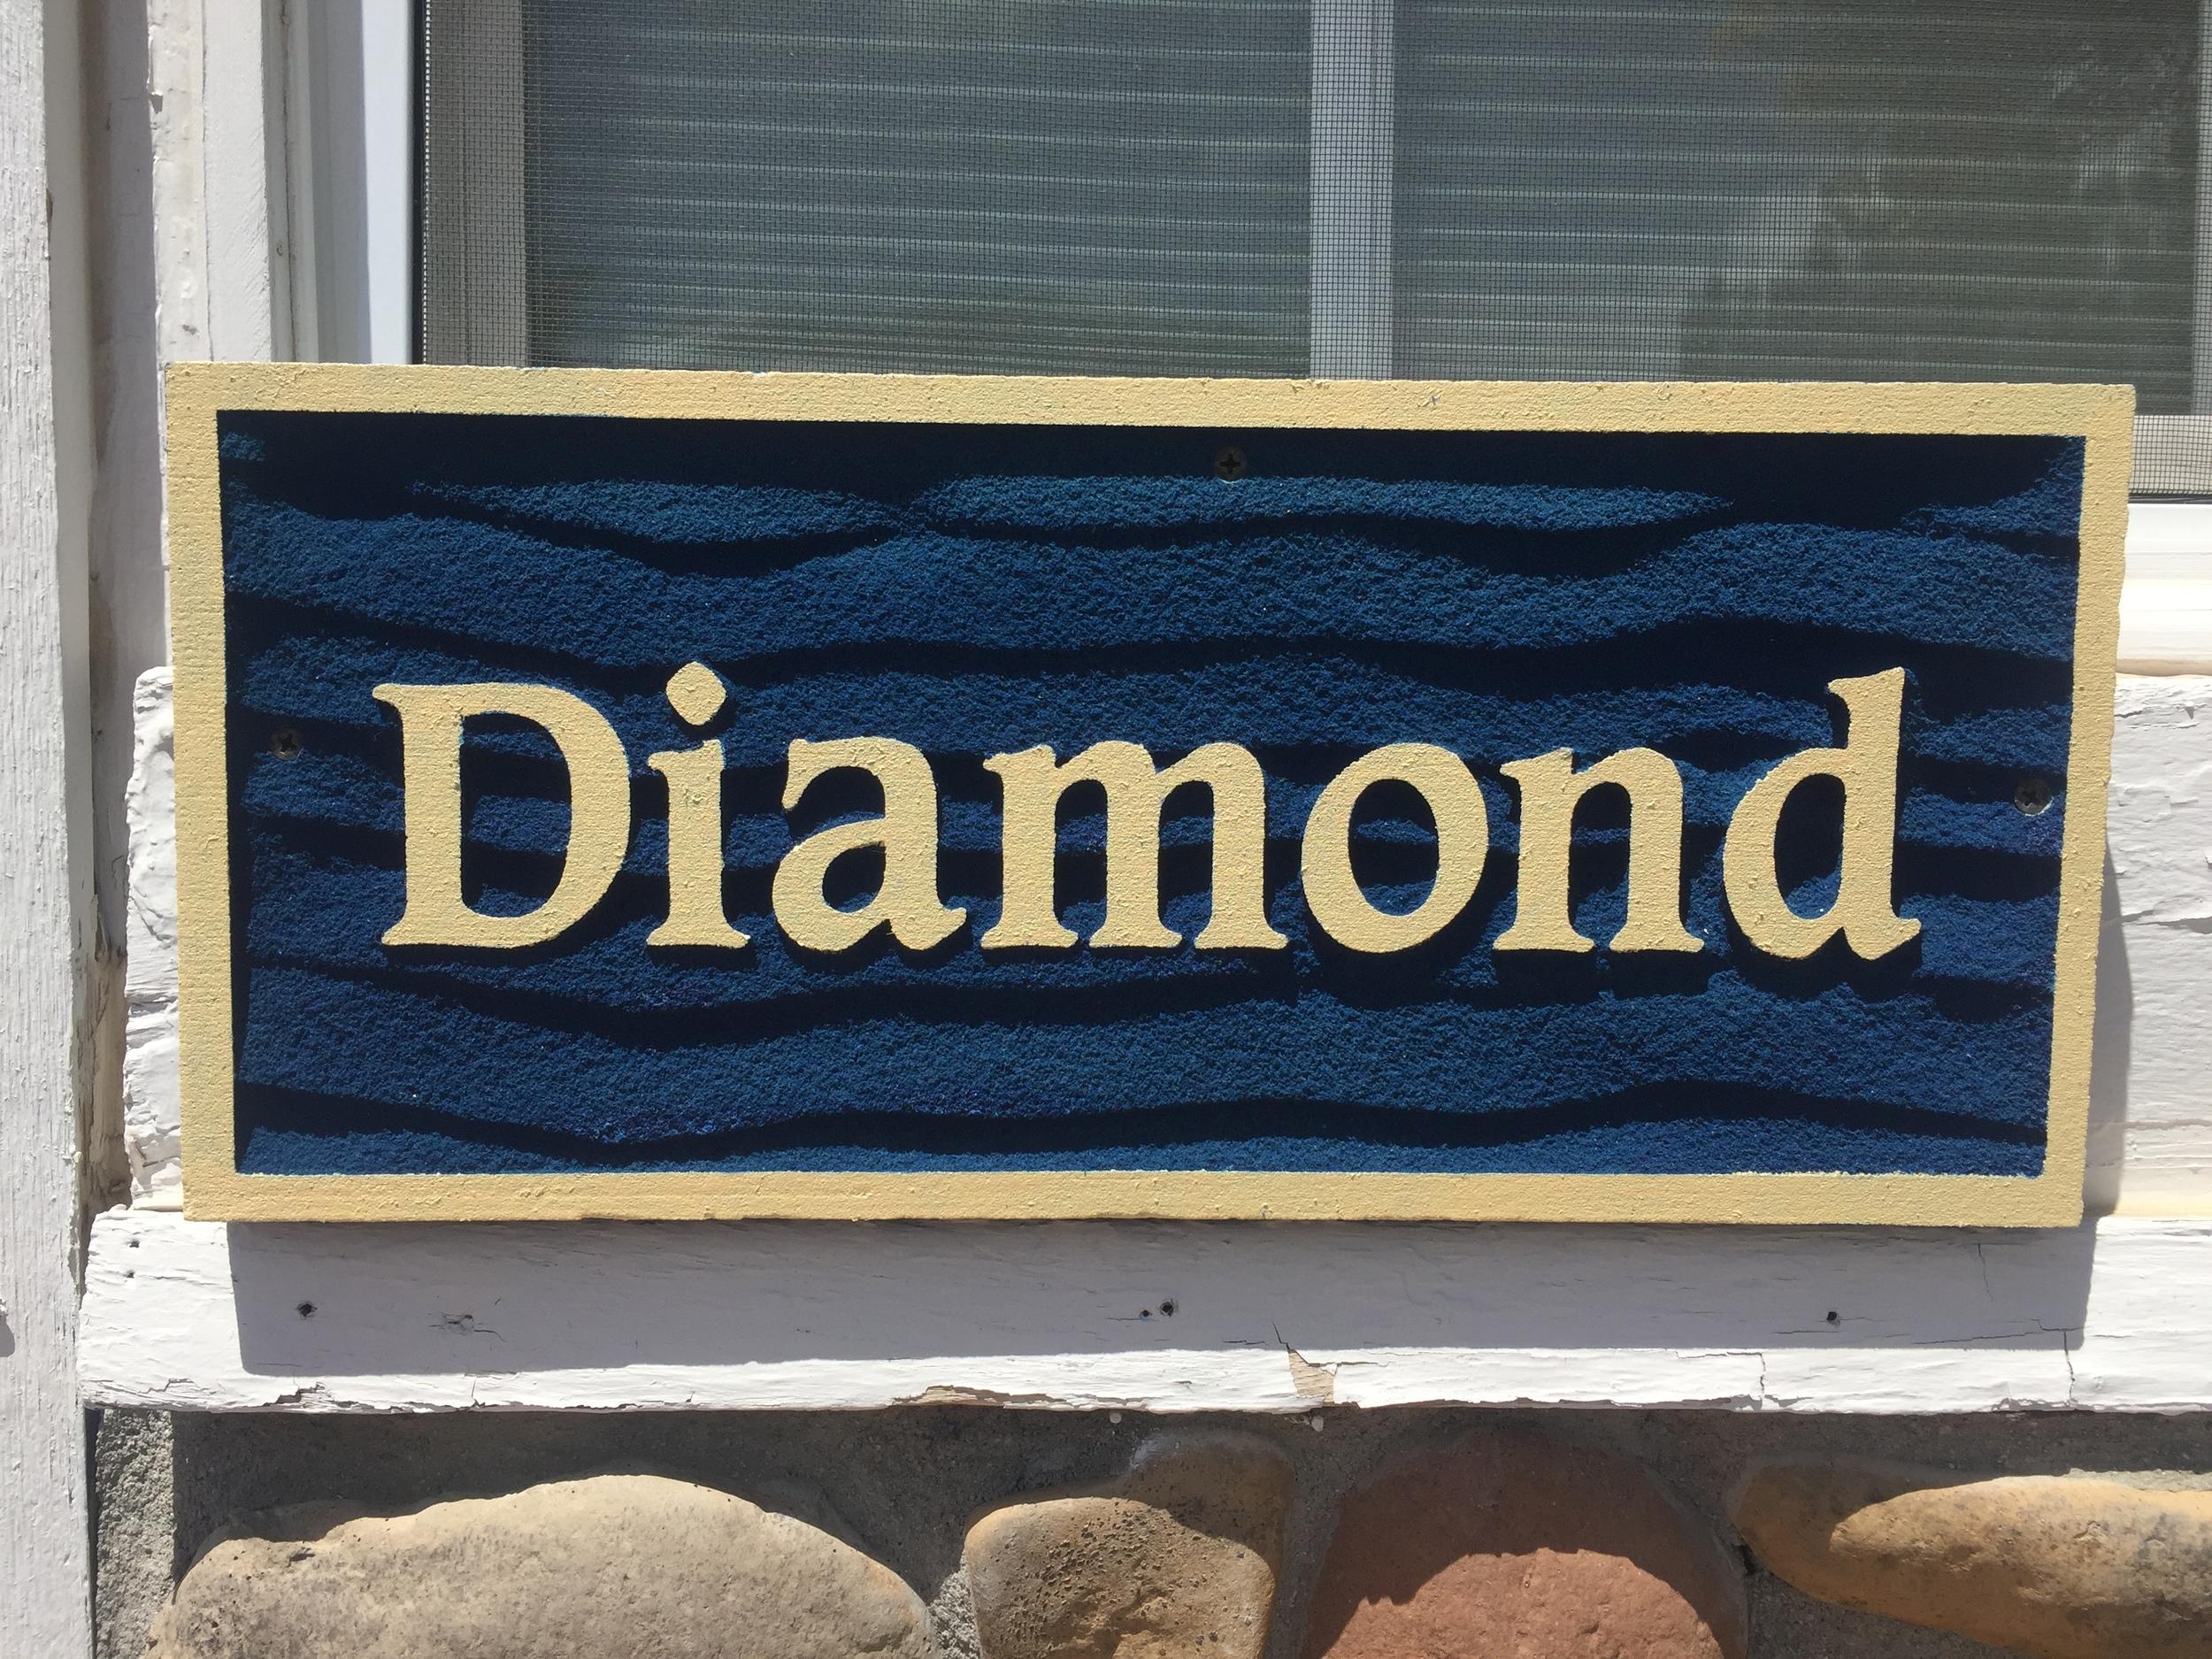 Diamond - Welcome!